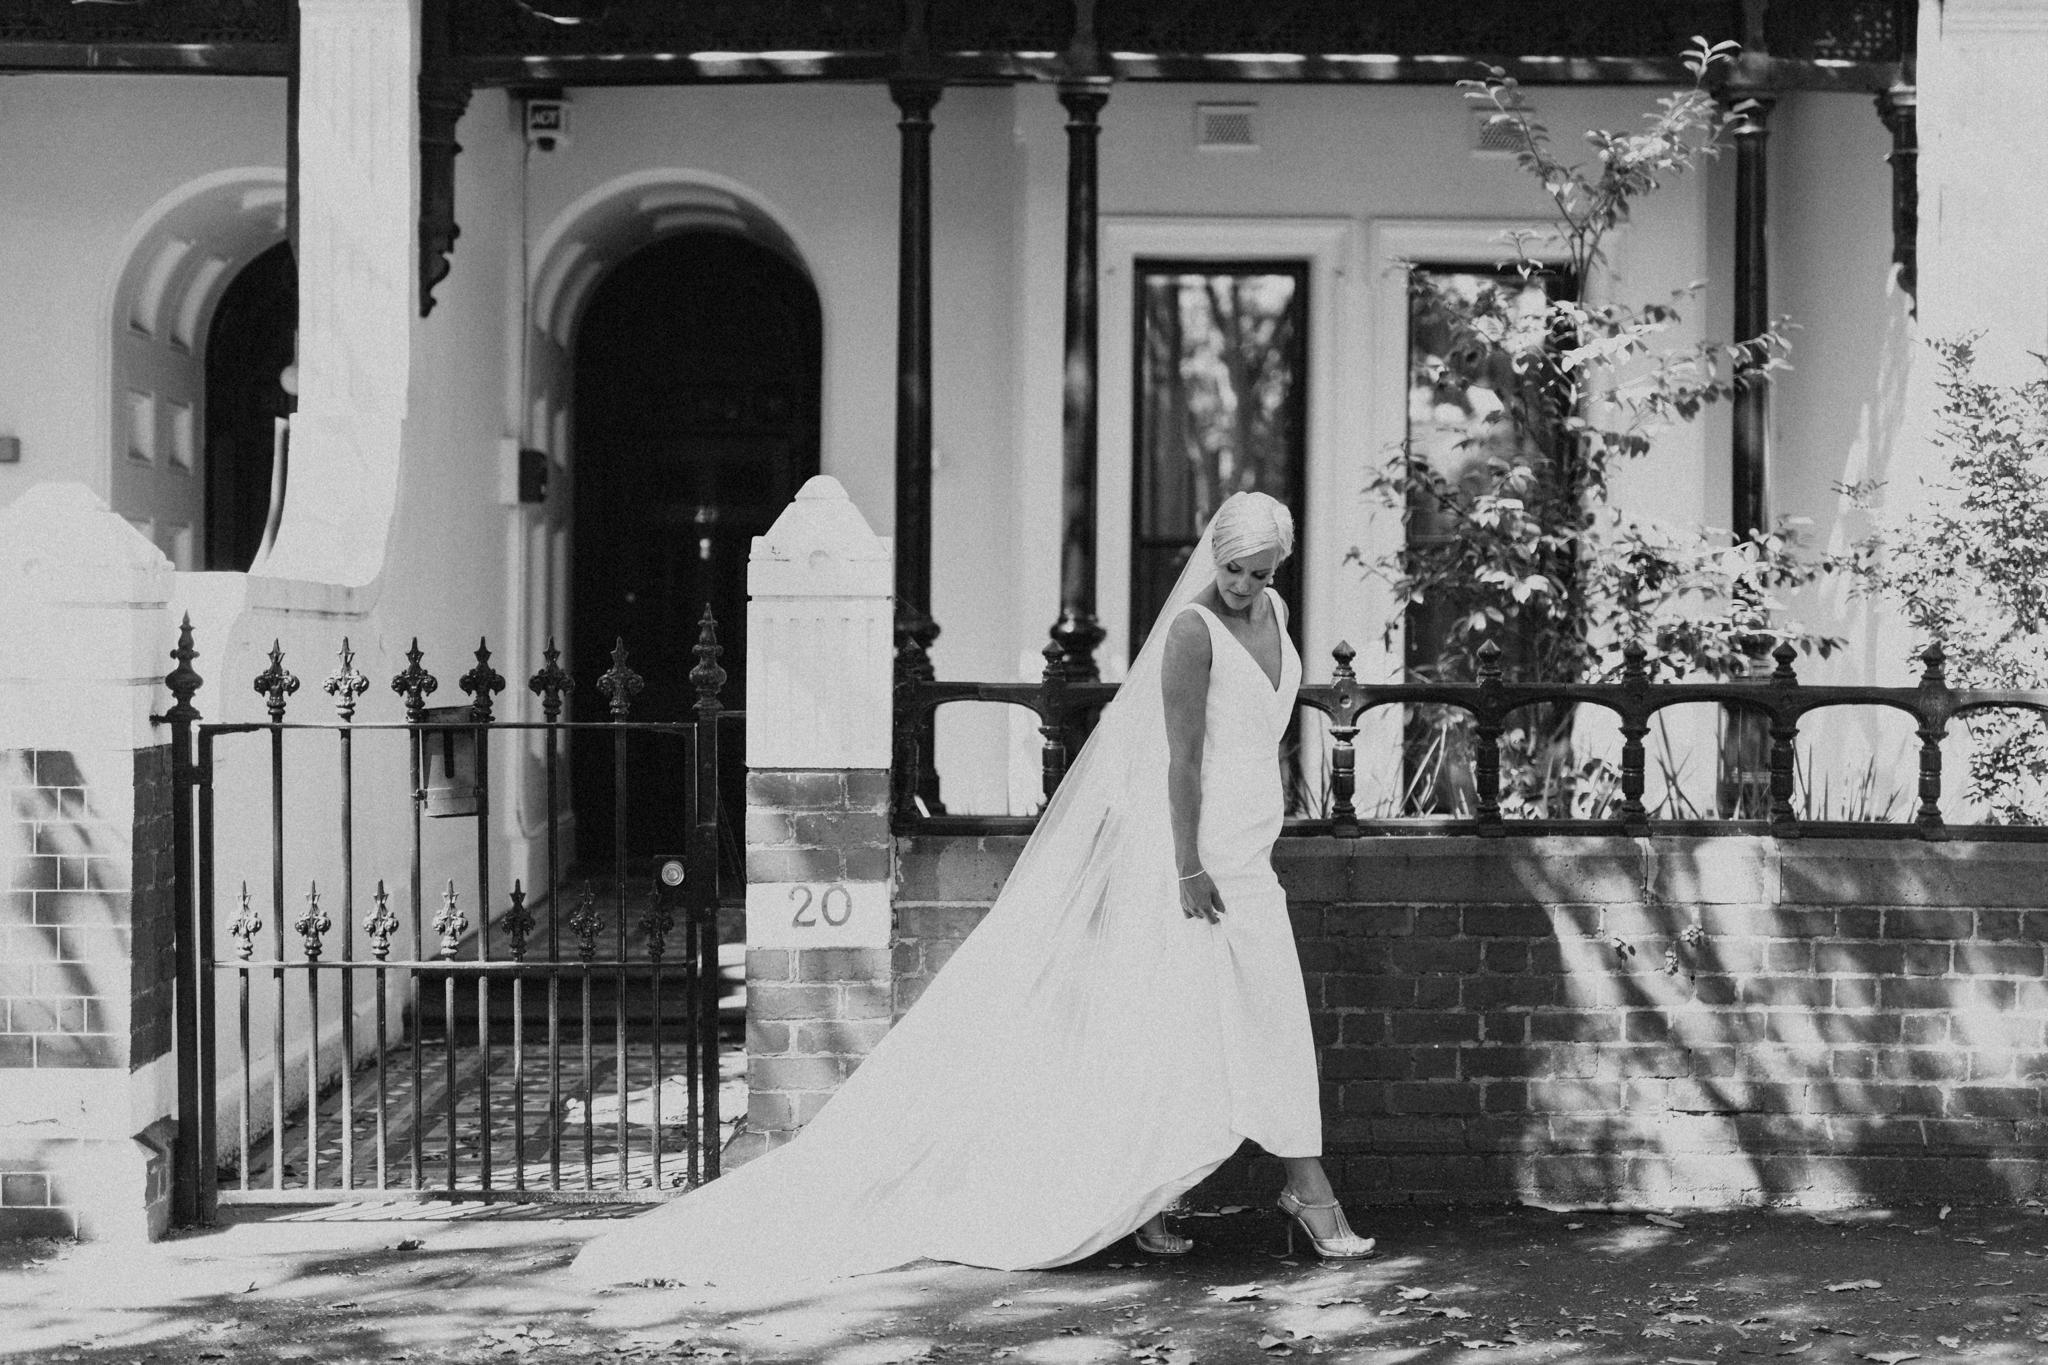 St-Kilda-Garden-Wedding-Emotions-and-Math-Photograph-096.jpg